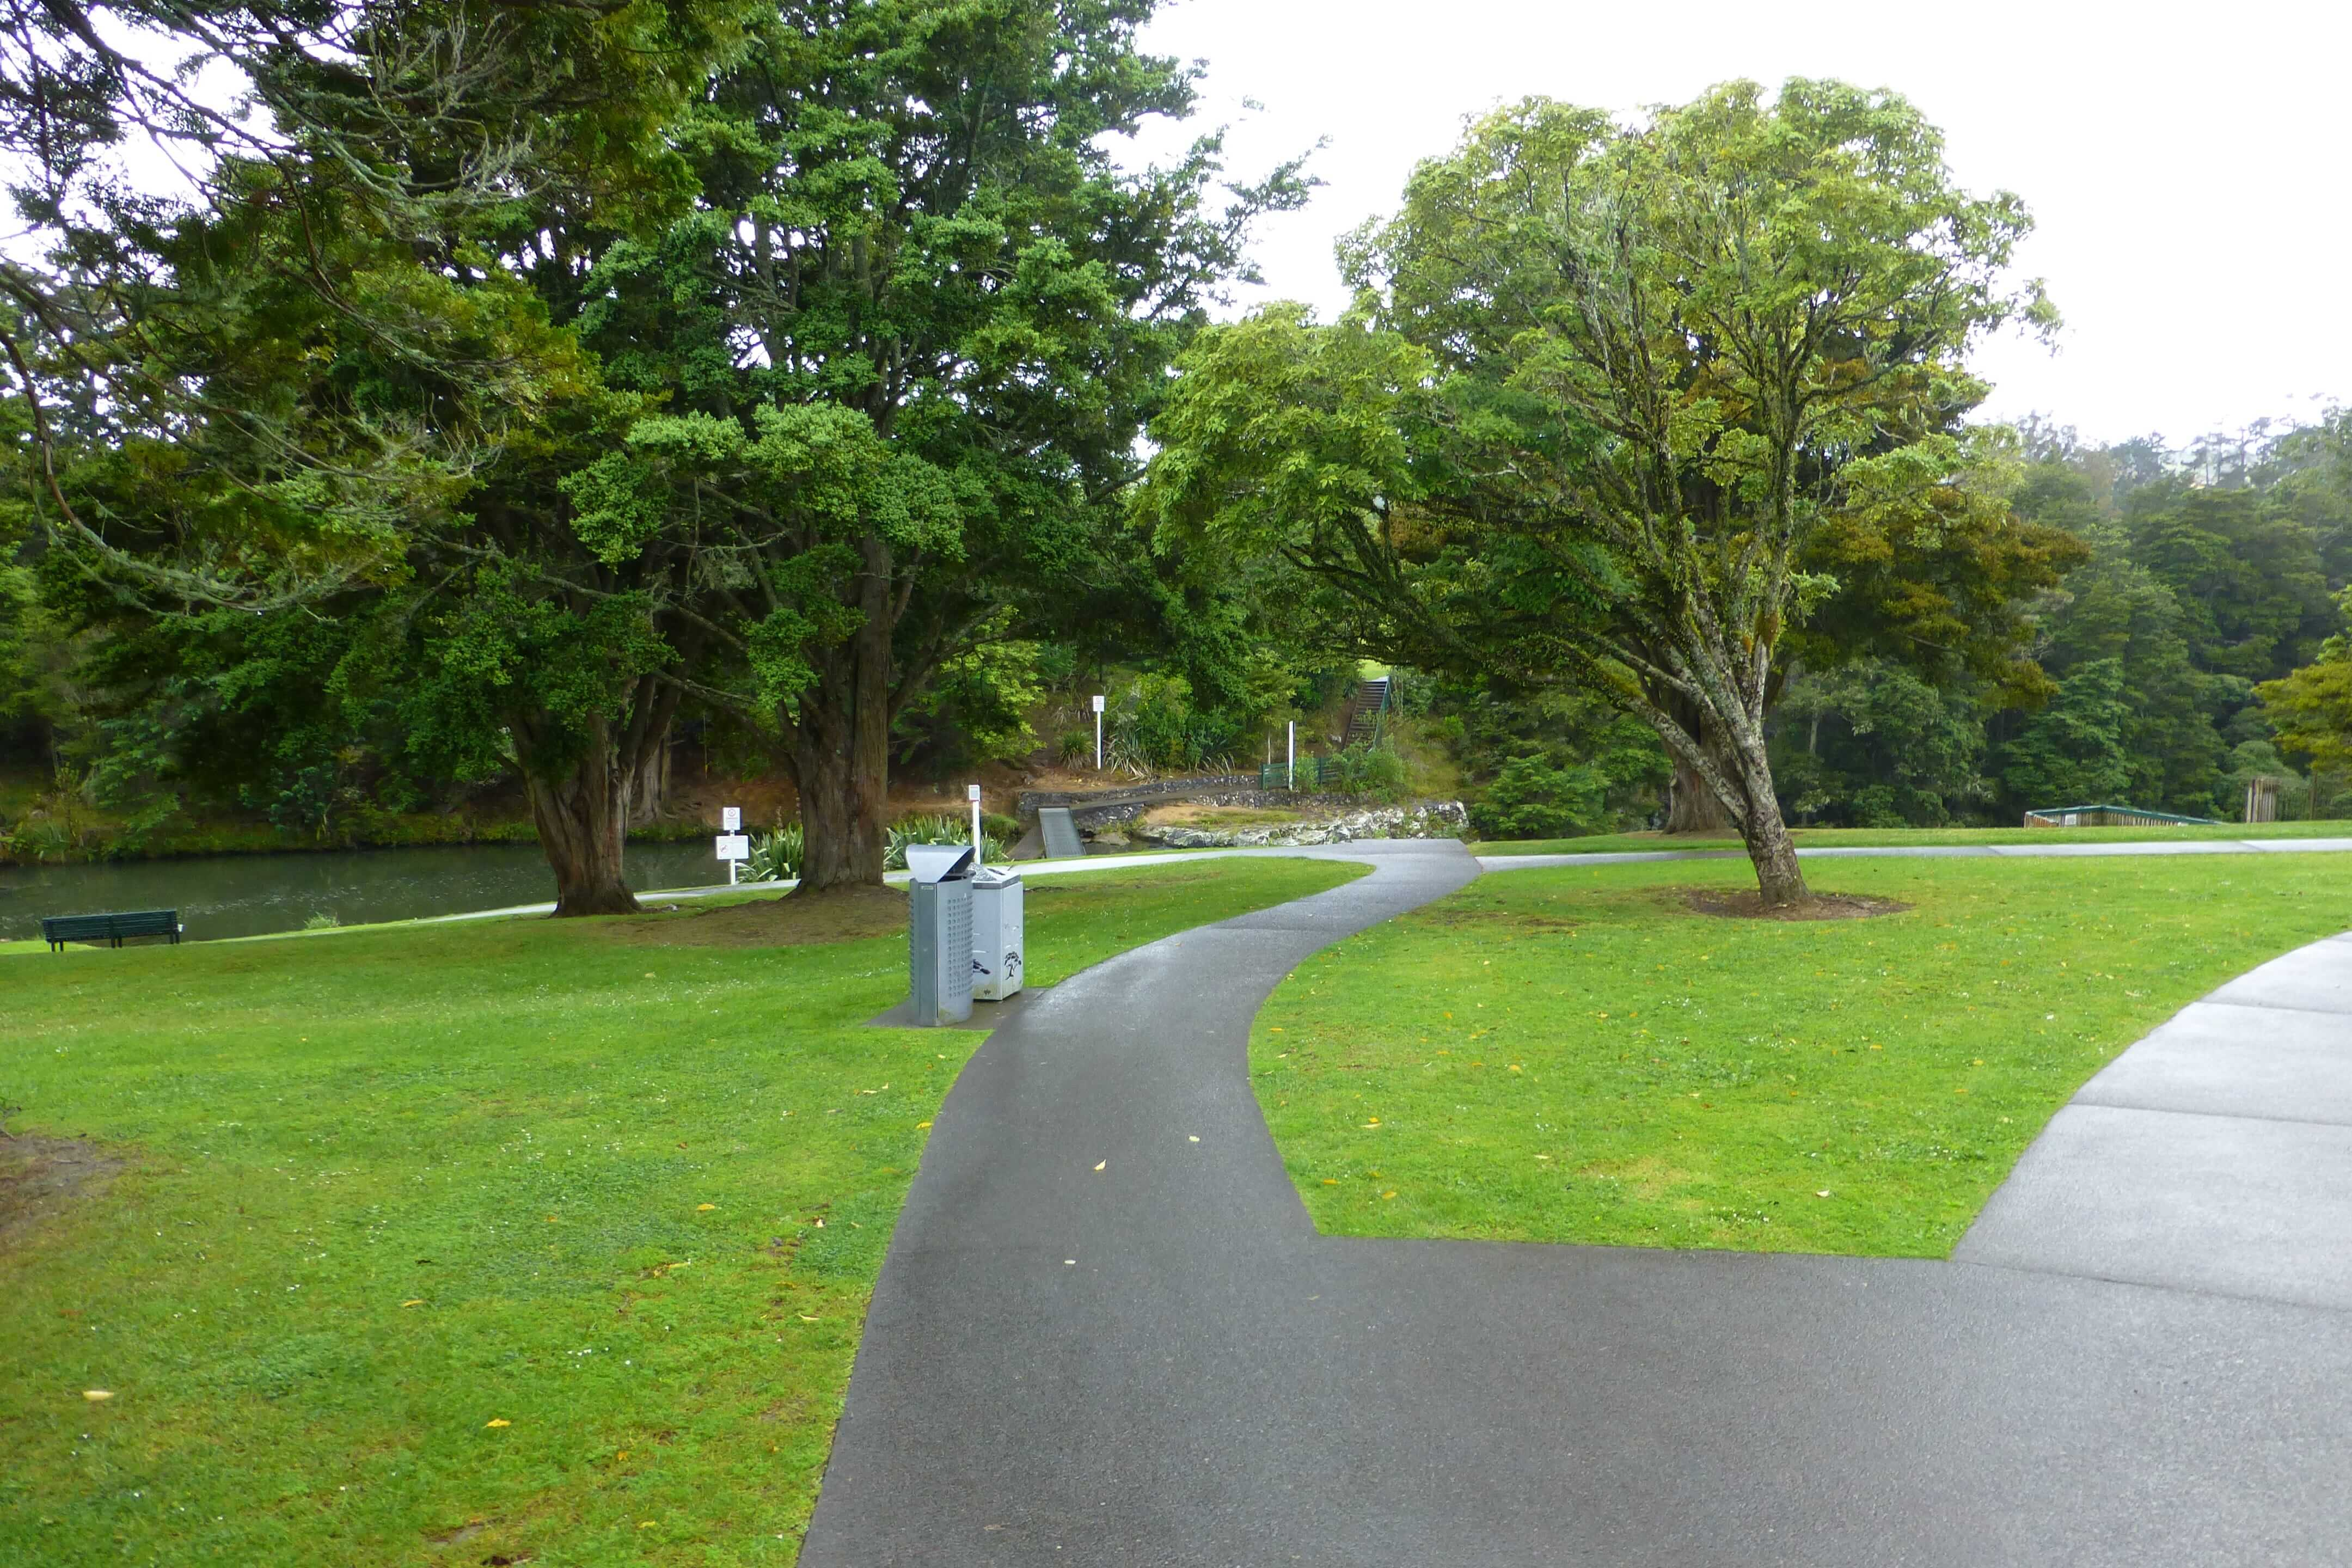 Weit weg Reisen, Whangarei Falls, Neuseeland 1